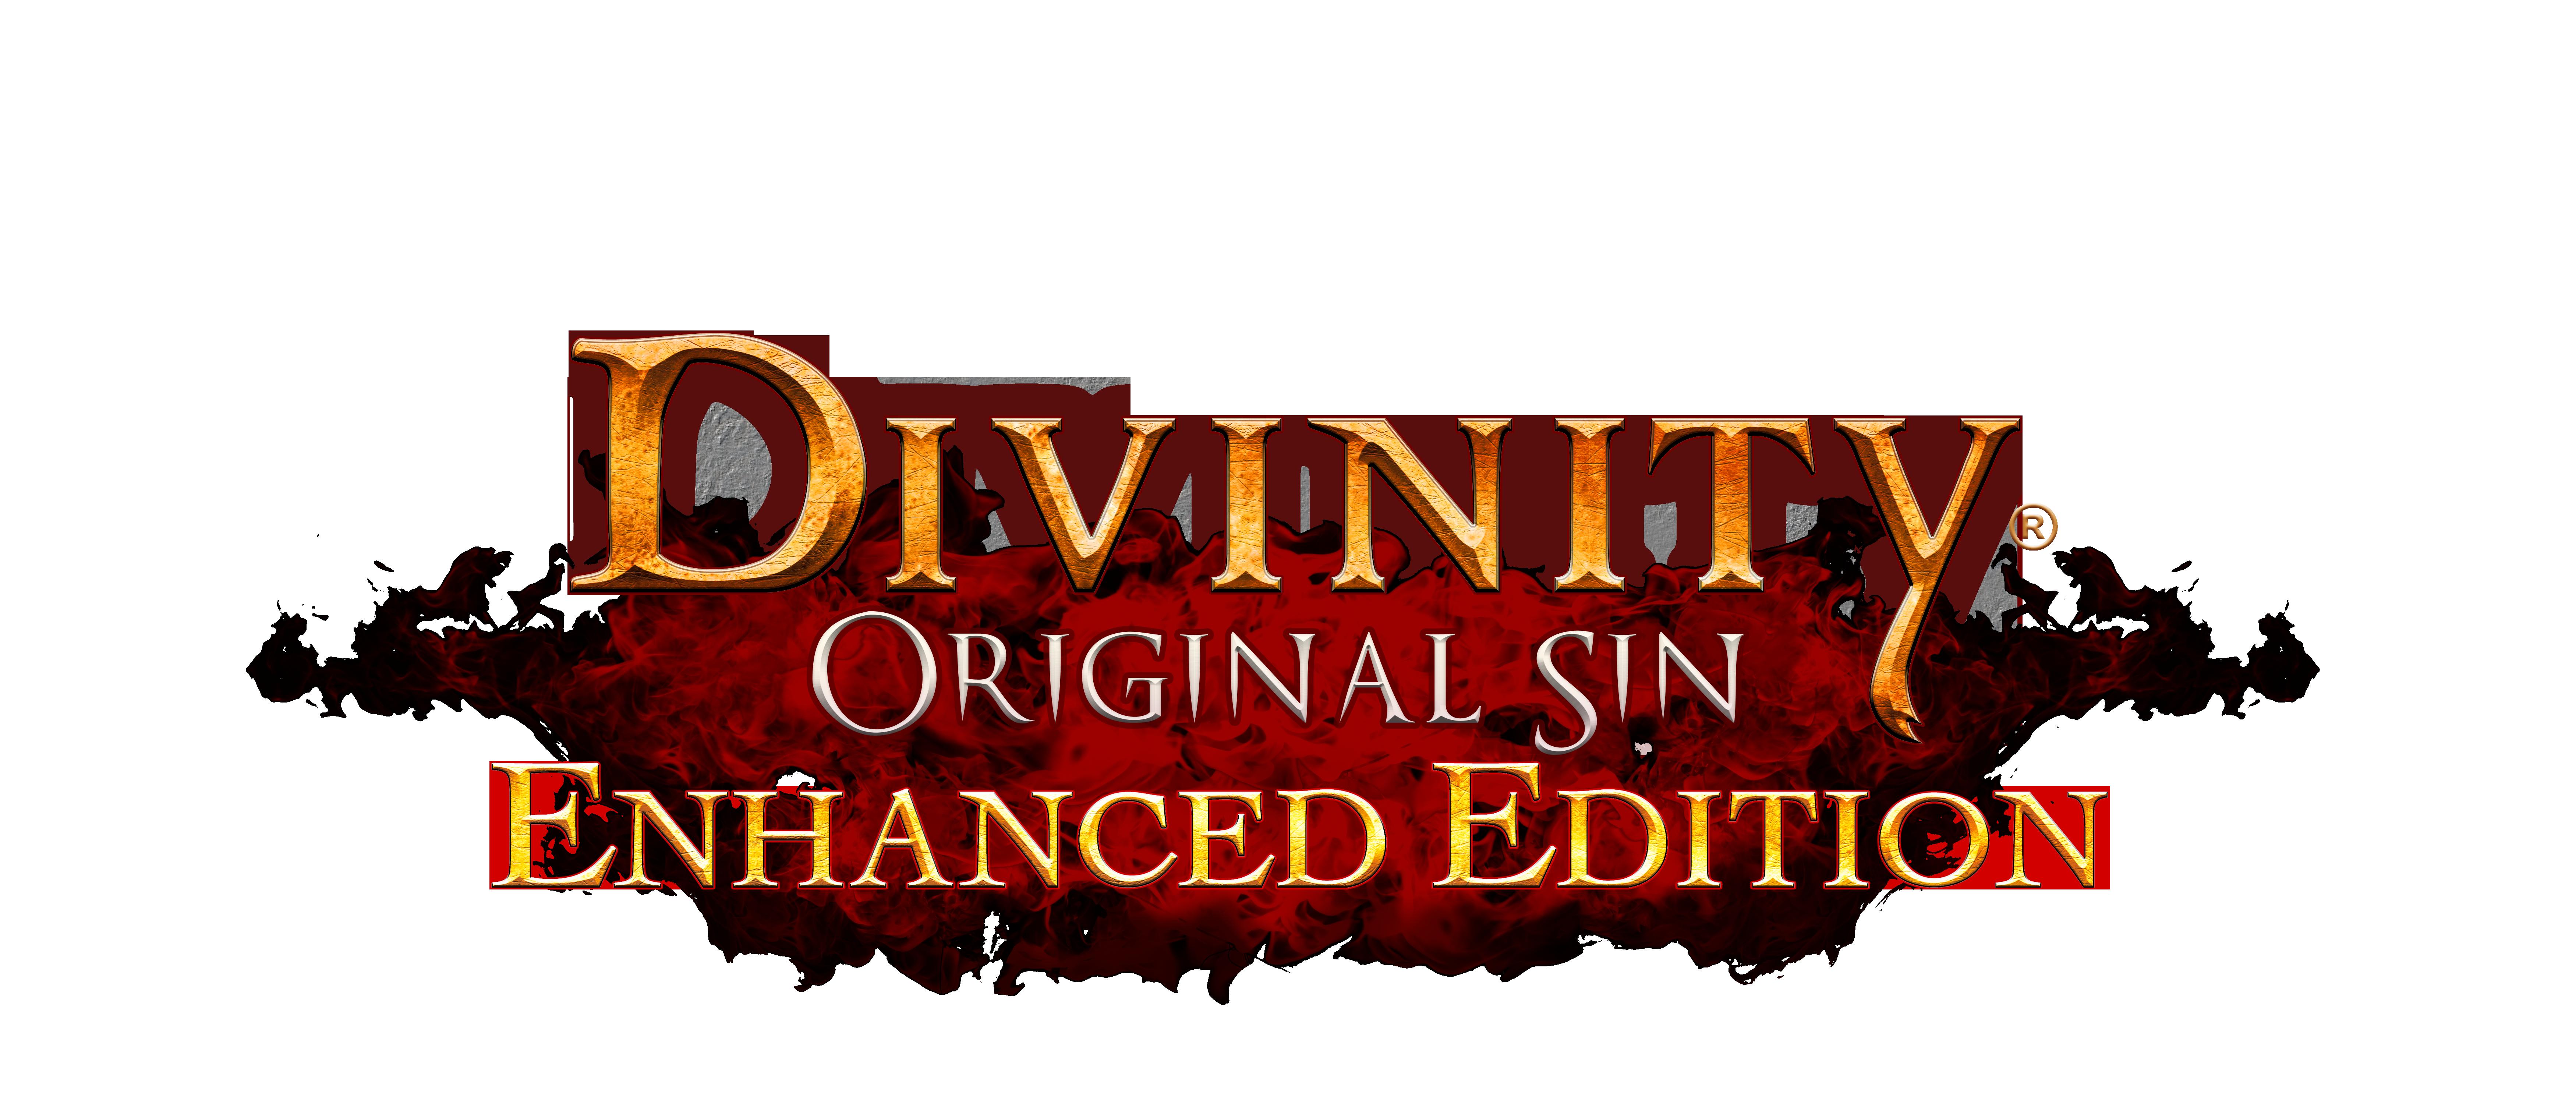 Divinity Original Sin PNG-PlusPNG.com-7000 - Divinity Original Sin PNG